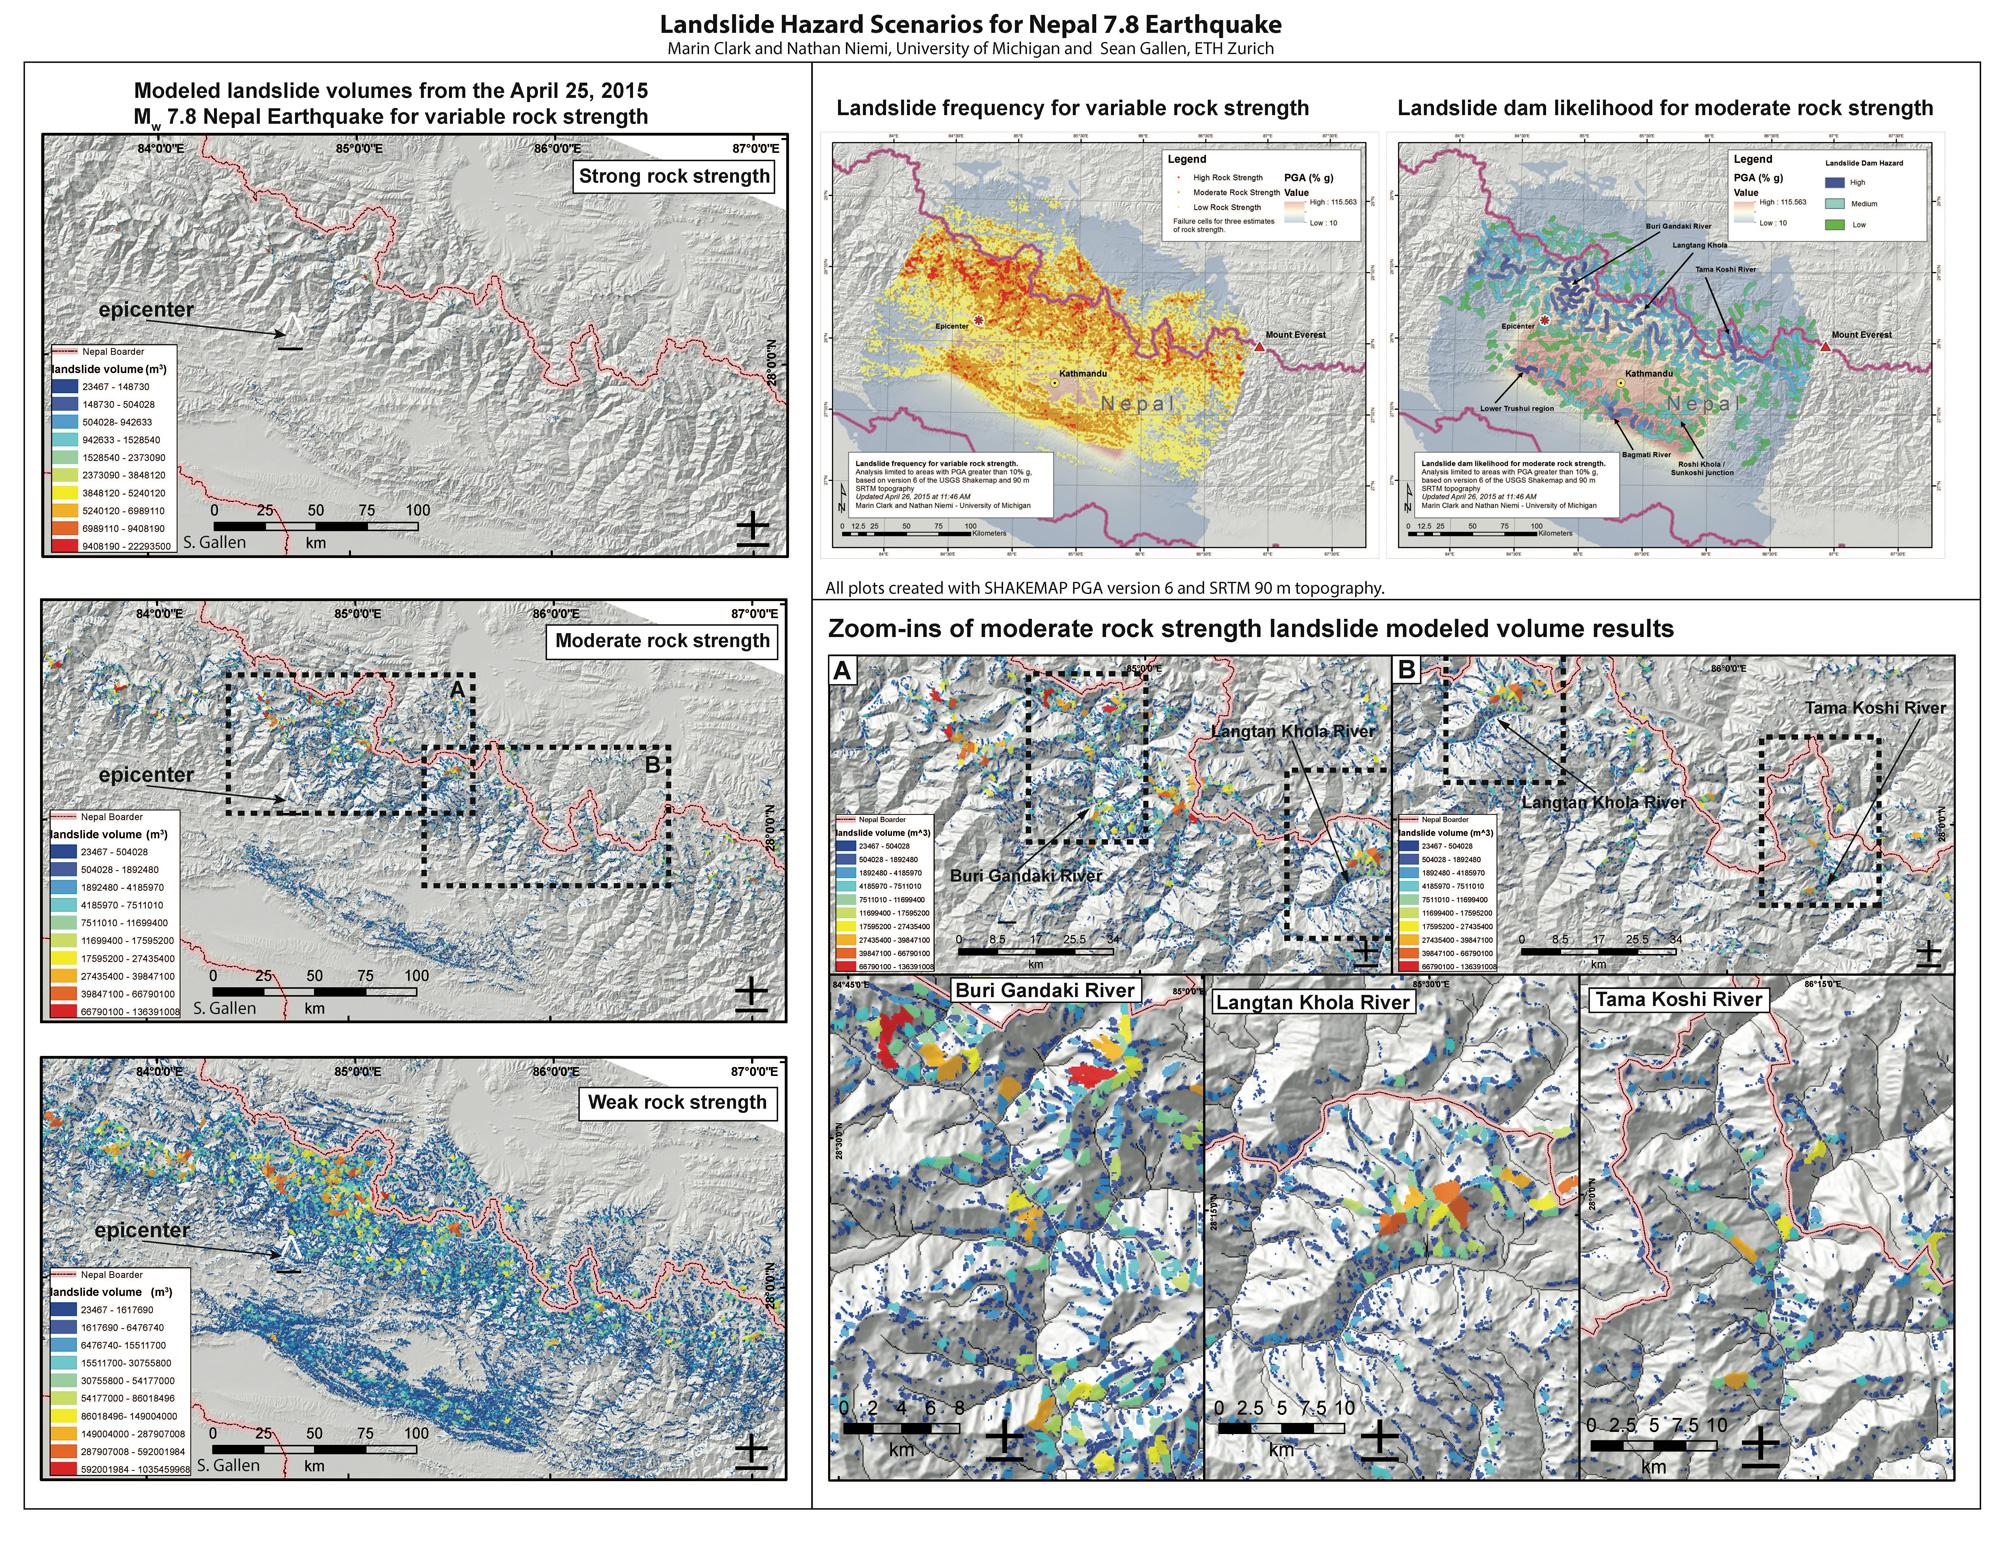 Map Of Landslide And Landslide Dam Hazard Potential Credit Marin Clark Nathan Niemi And Sean Gallen